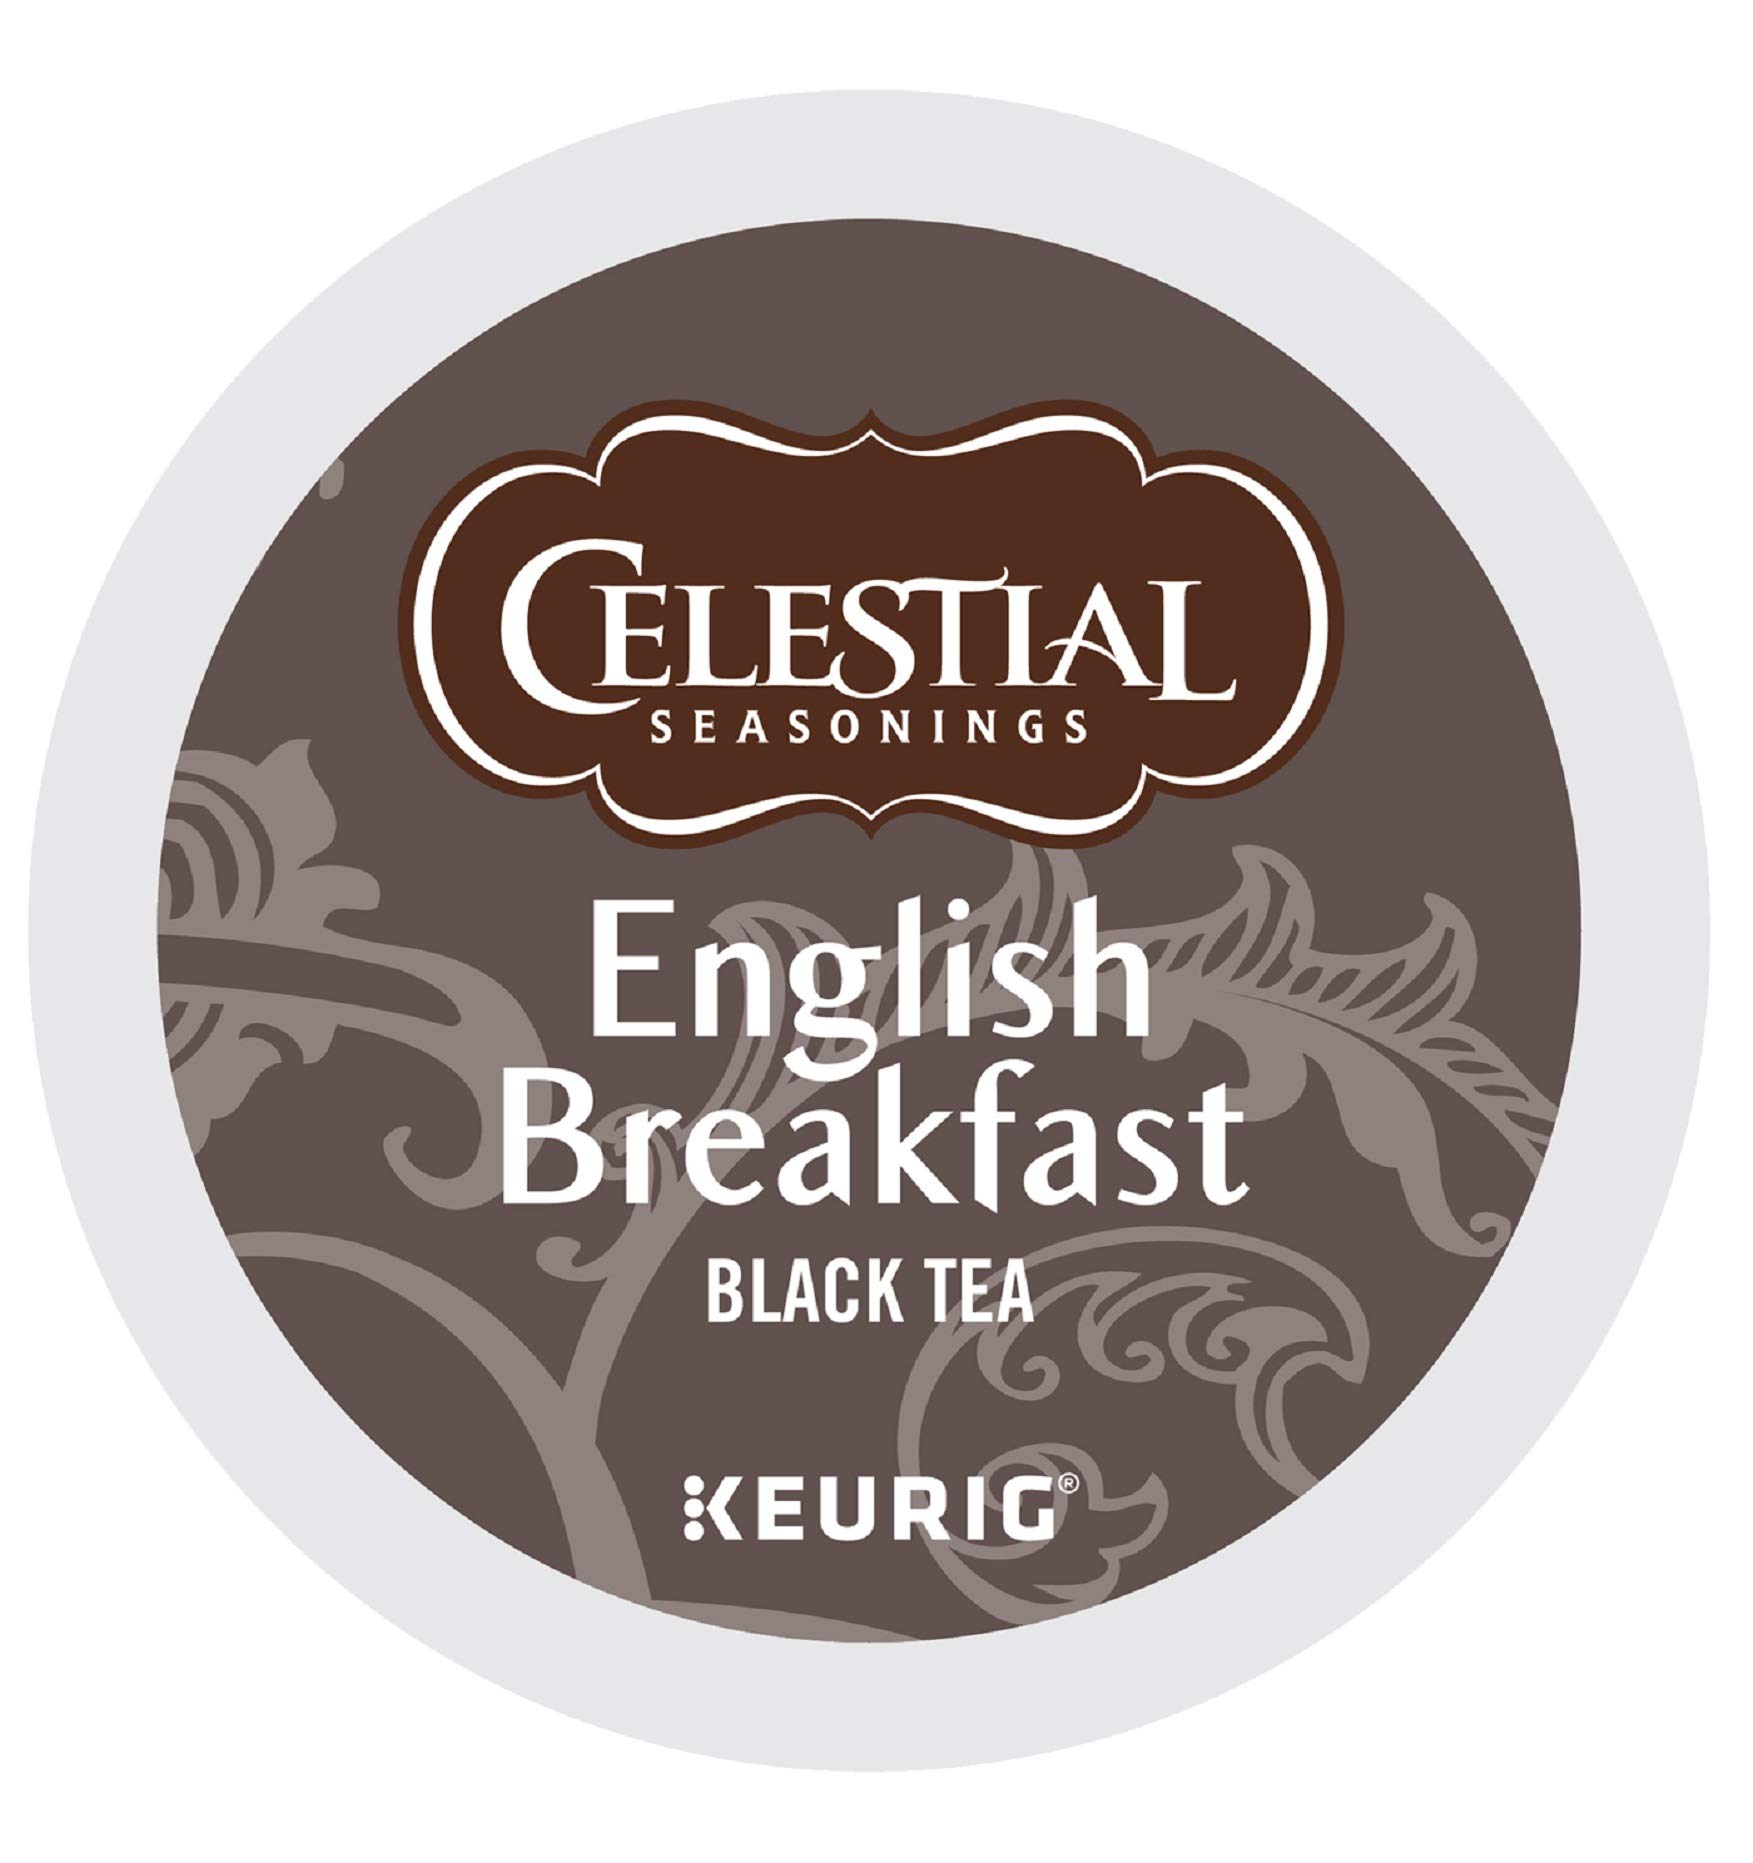 Celestial Seasonings English Breakfast Tea, Single-Serve Keurig K-Cup Pods, Classic English Tea, 96 Count by Celestial Seasonings